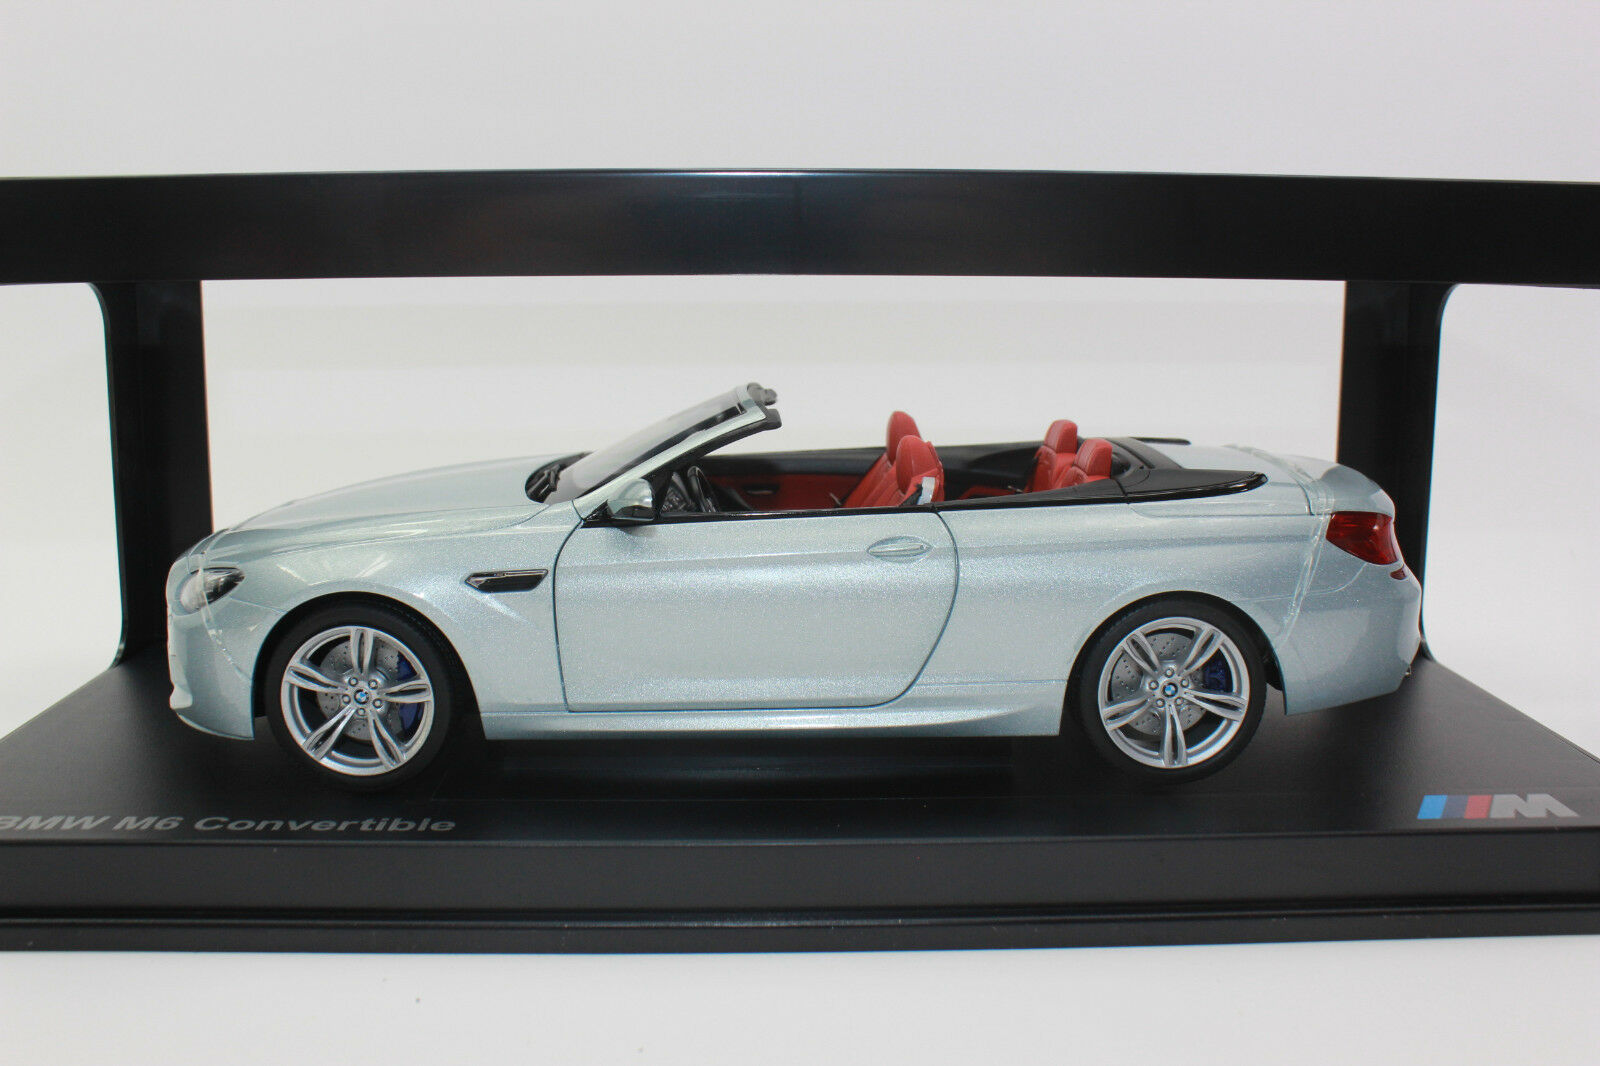 Venta  Paragon 80432253656 BMW BMW BMW M6 Converdeible platastone 2012 1 18 Nuevo en 70b515